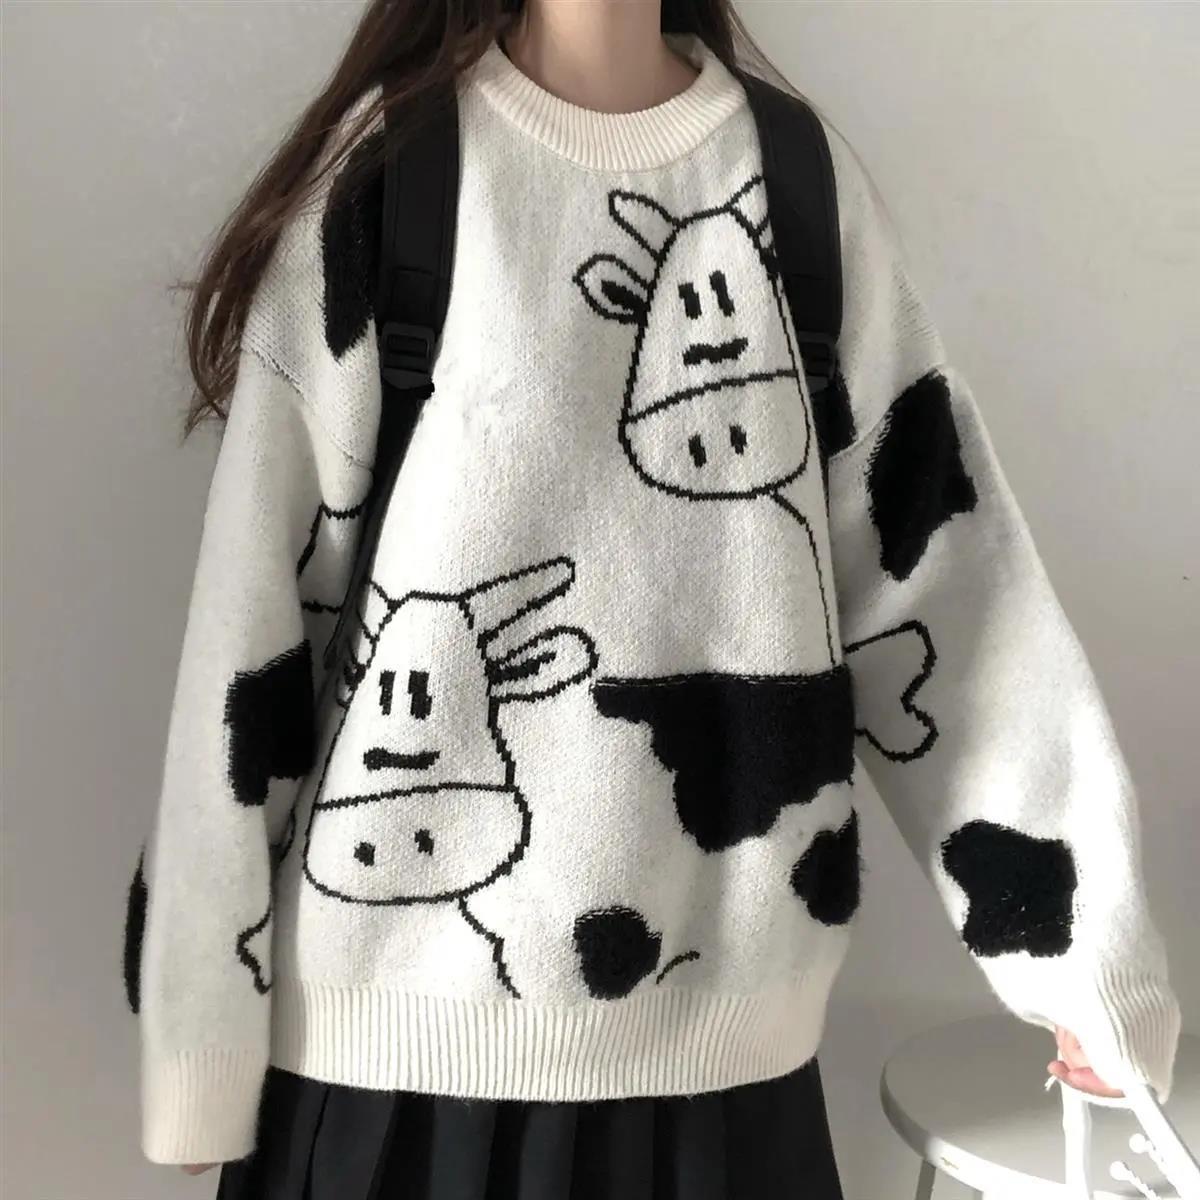 Egirl Harajuku pullover with a cow print 42